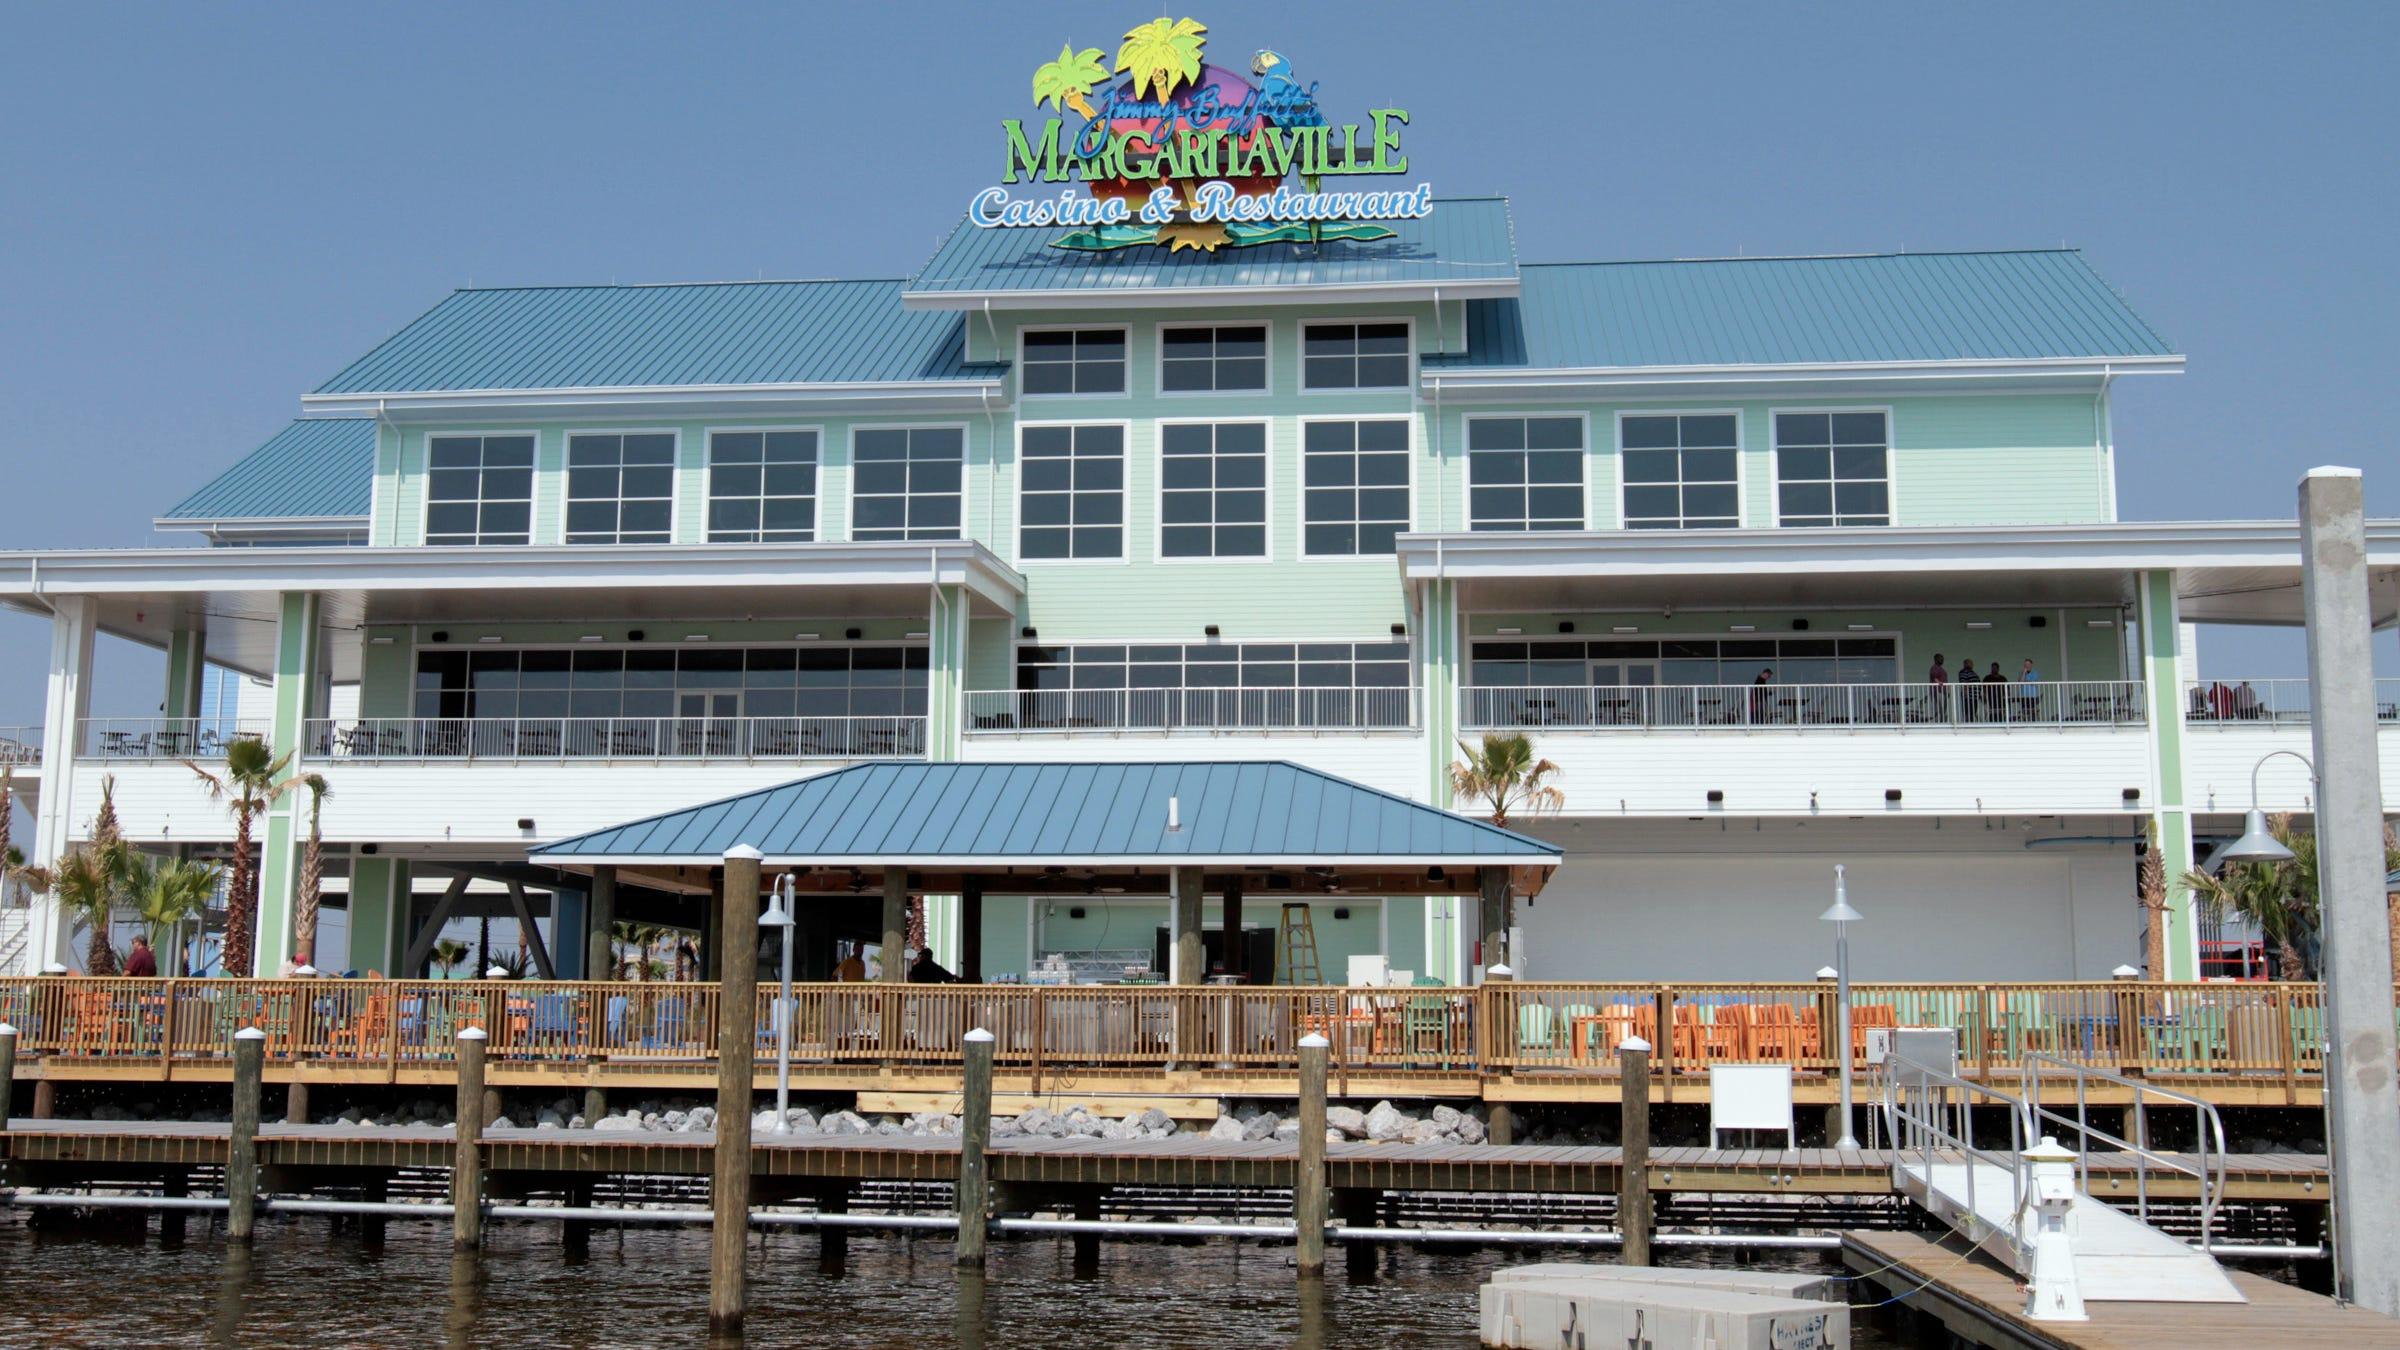 Biloxi S Margaritaville Casino To Close By September